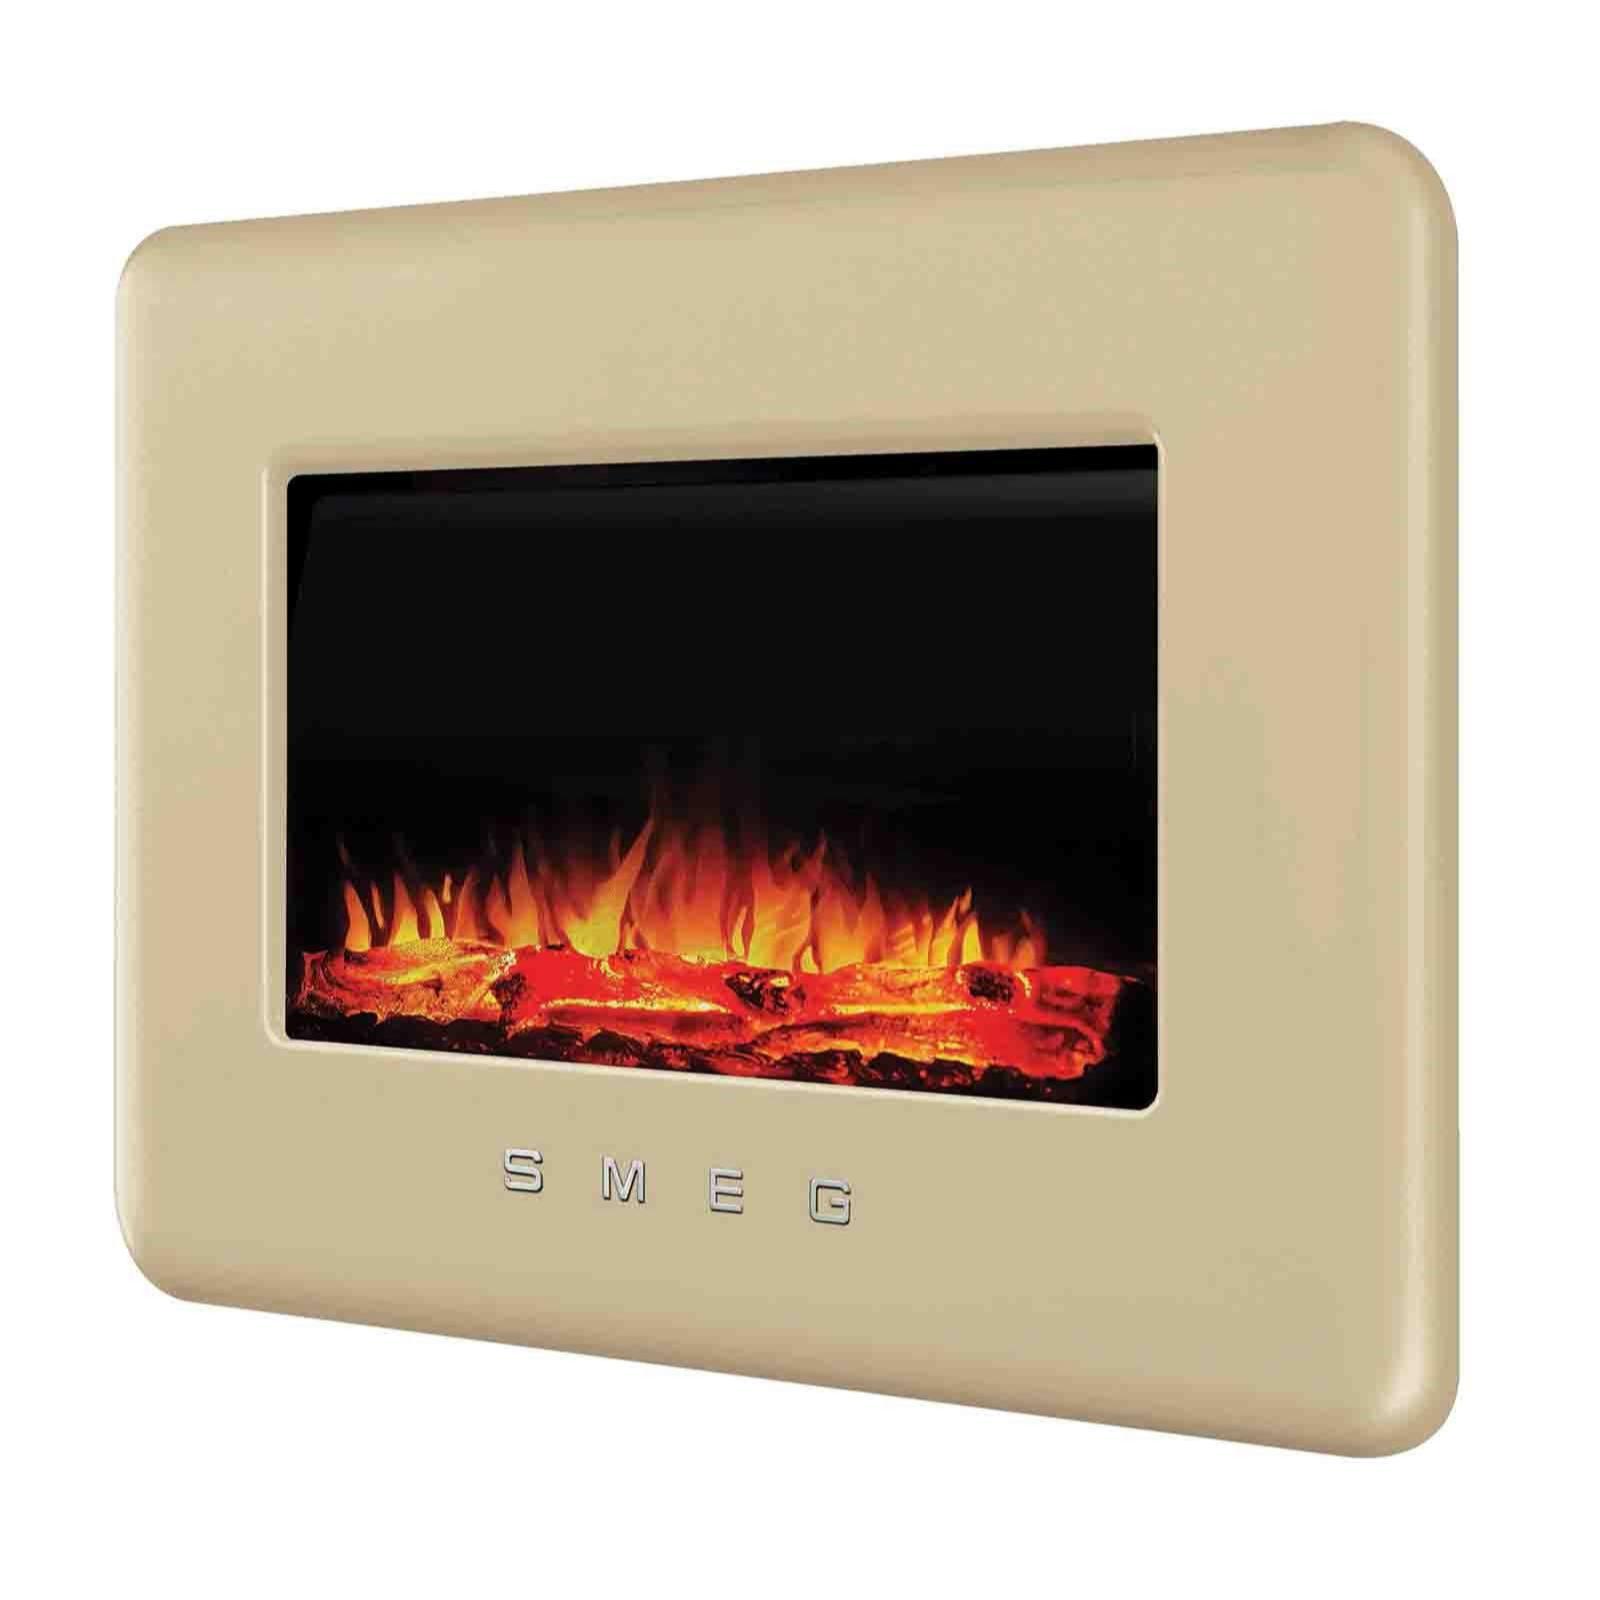 smeg retro l30fabe wallmounted electric fireplace w remote control